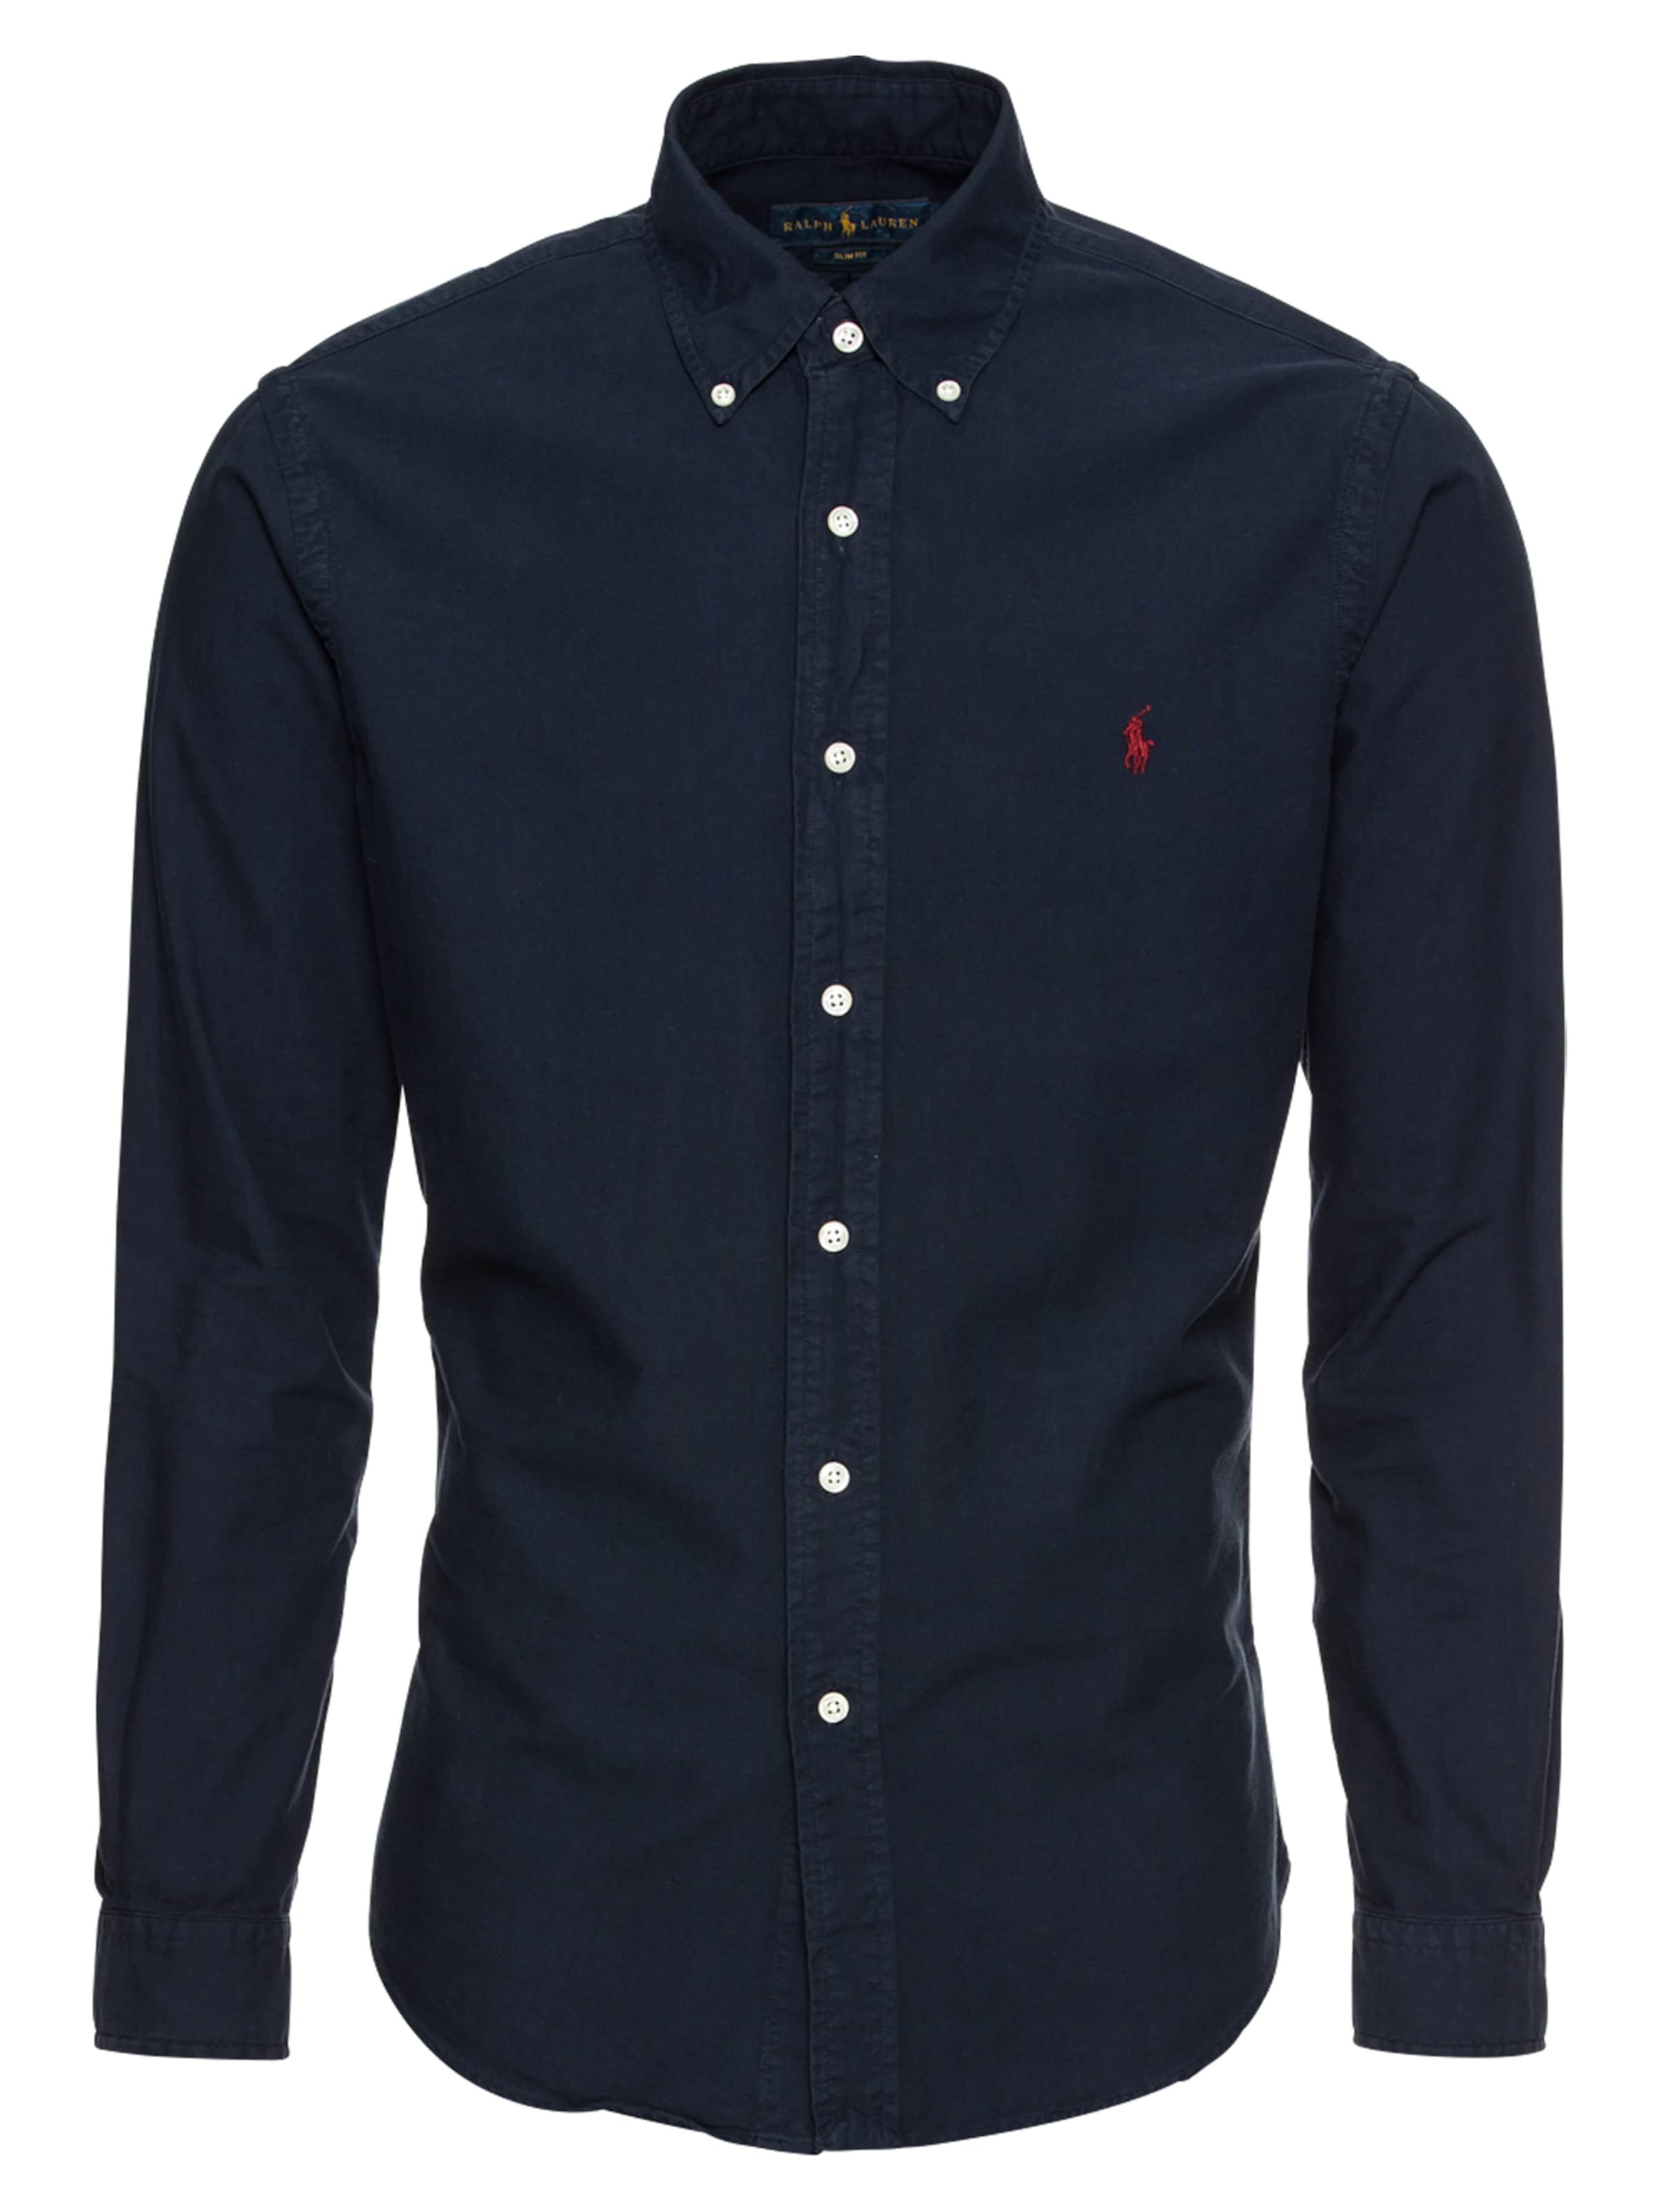 Bd En Polo sport Sleeve Chemise long Ralph Bleu Ppc Sp Shirt' 'sl Marine Lauren f7g6by